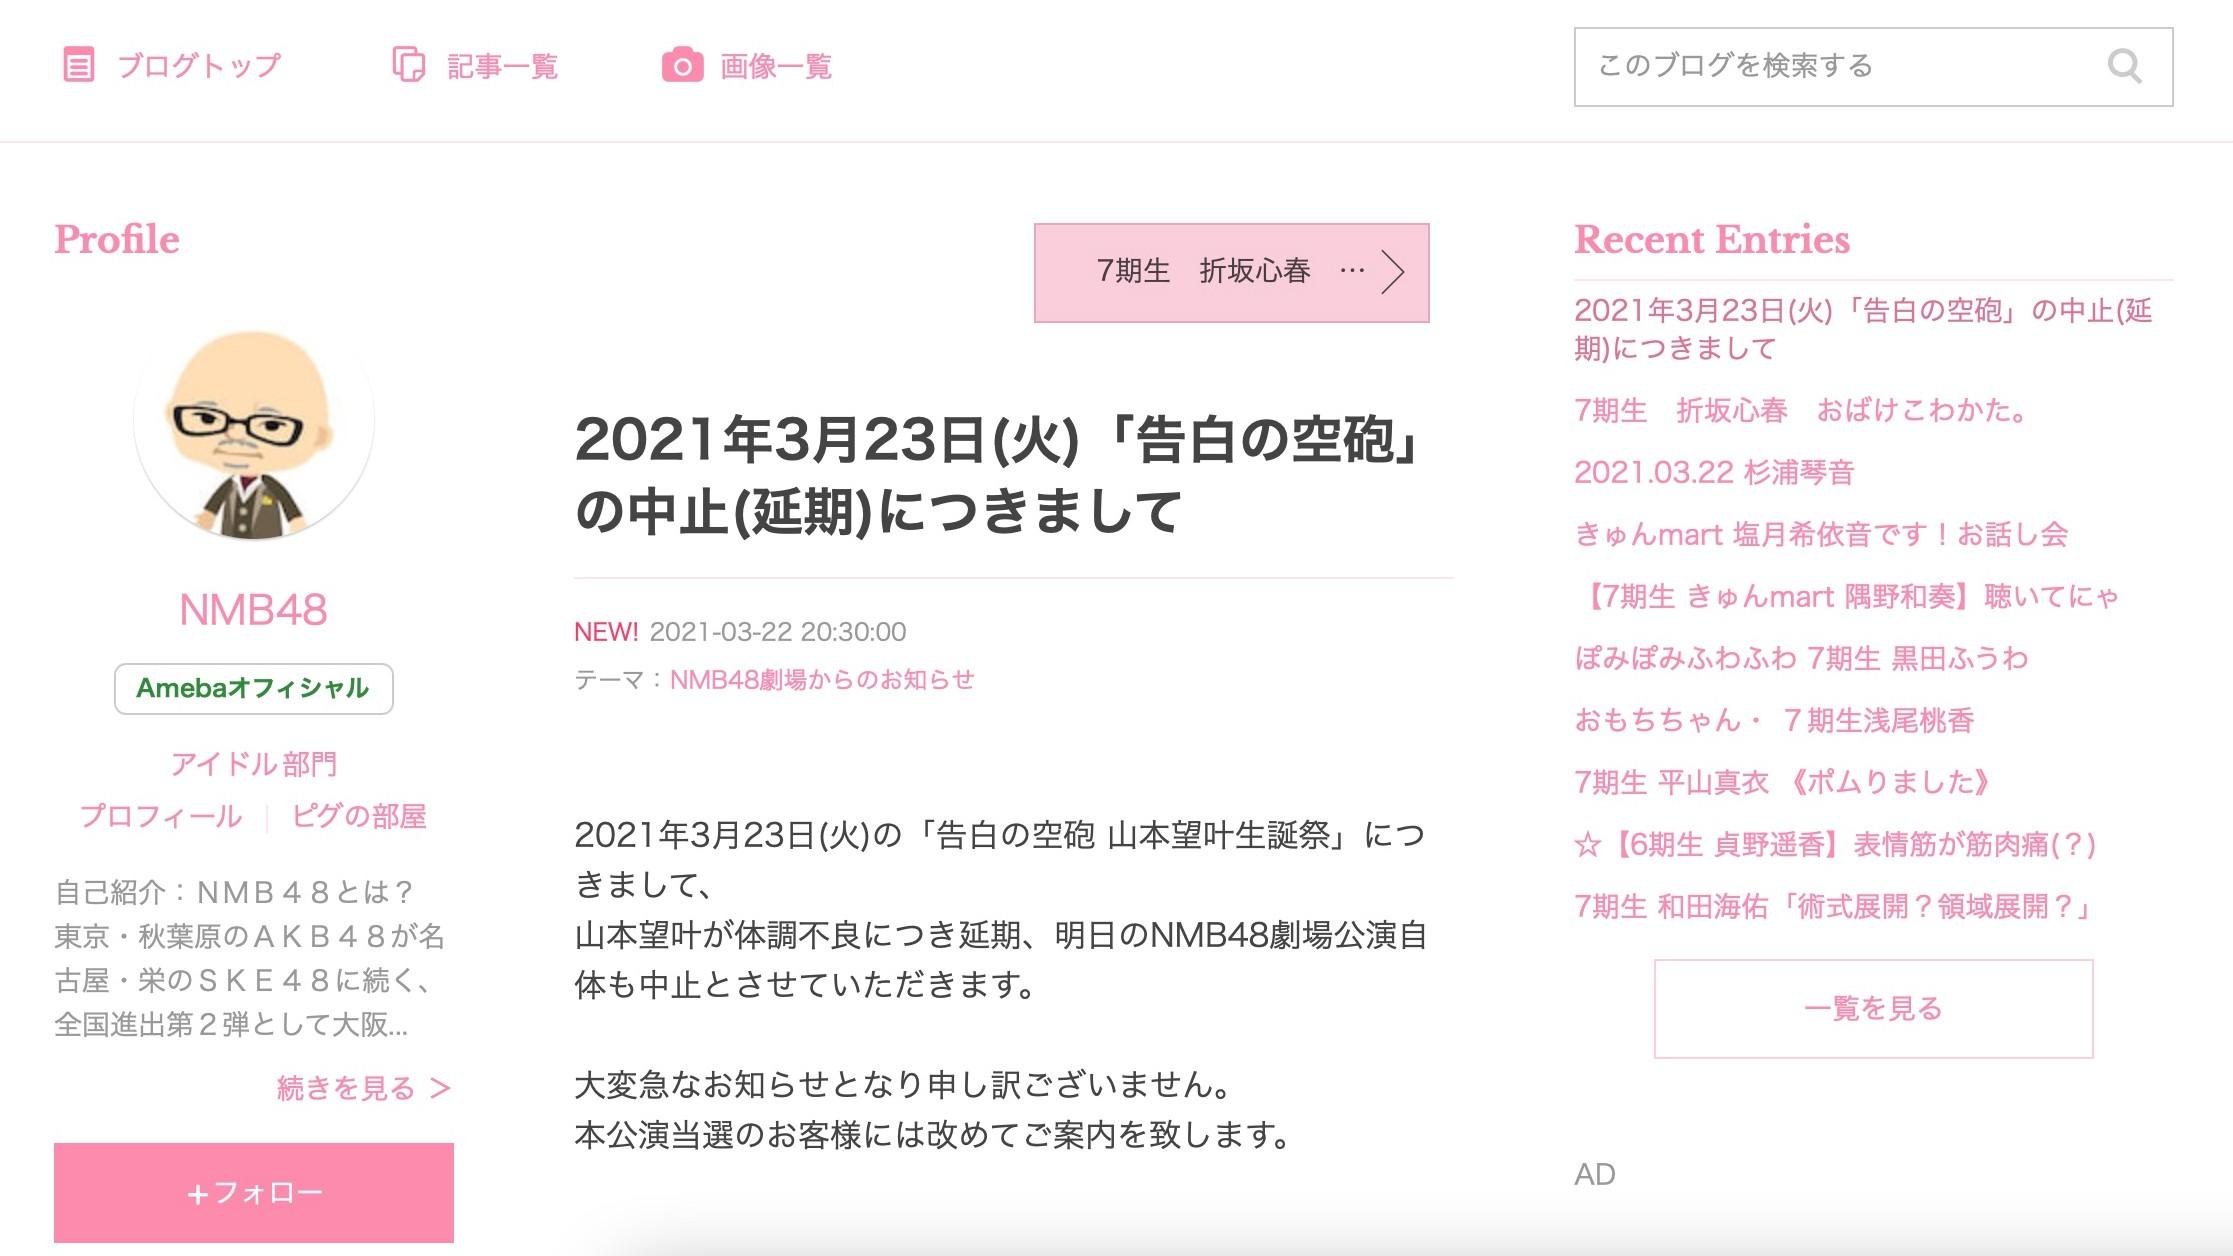 【NMB48】3月23日「告白の空砲 山本望叶生誕祭」が延期に